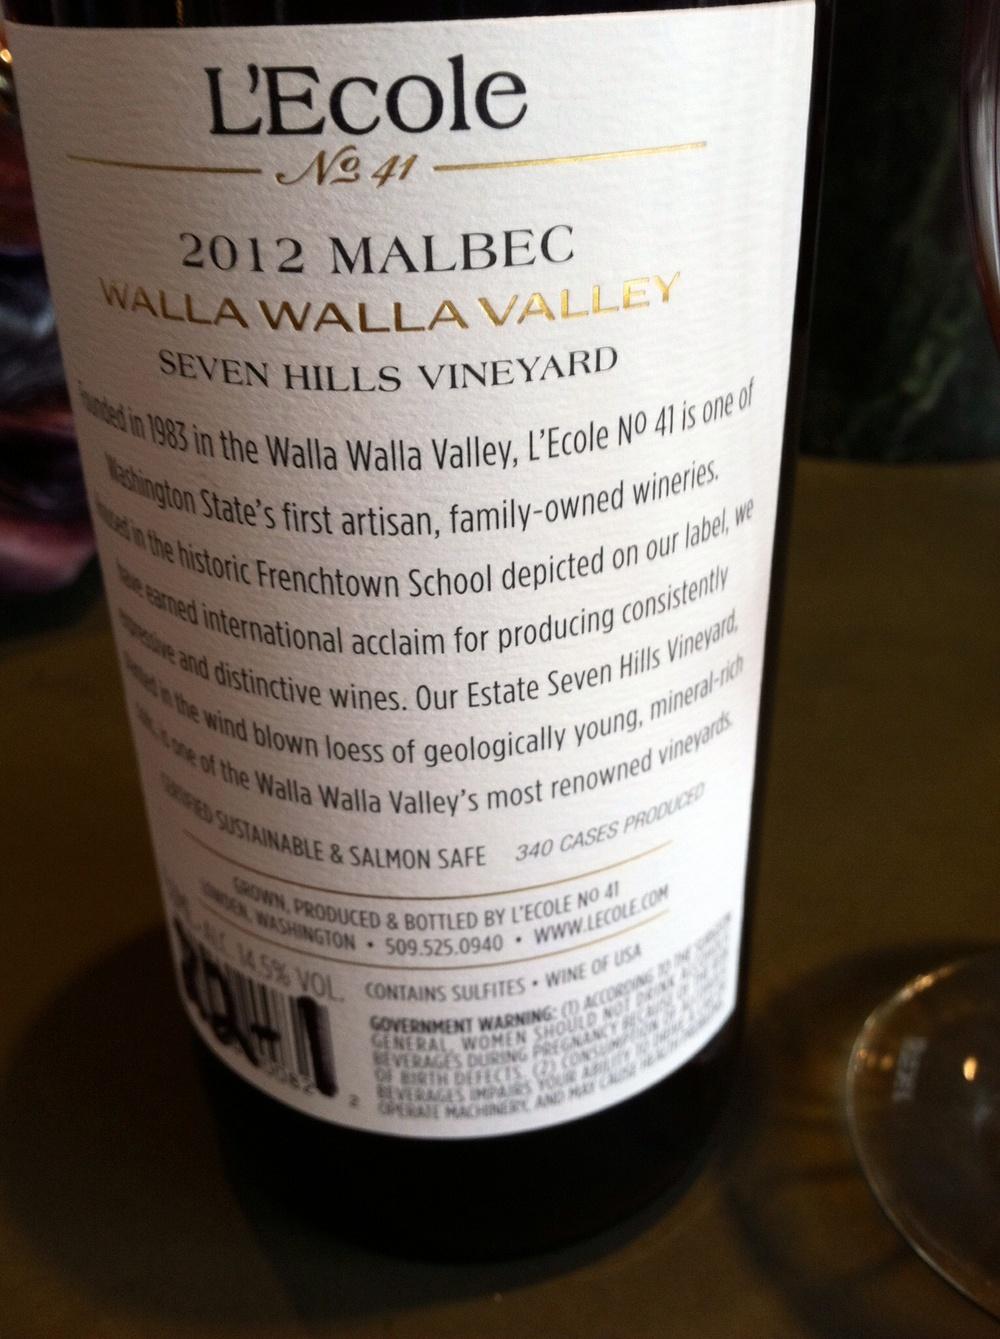 L'ecole 41 Malbec. Photo by Shana Sokol, Shana Speaks Wine.